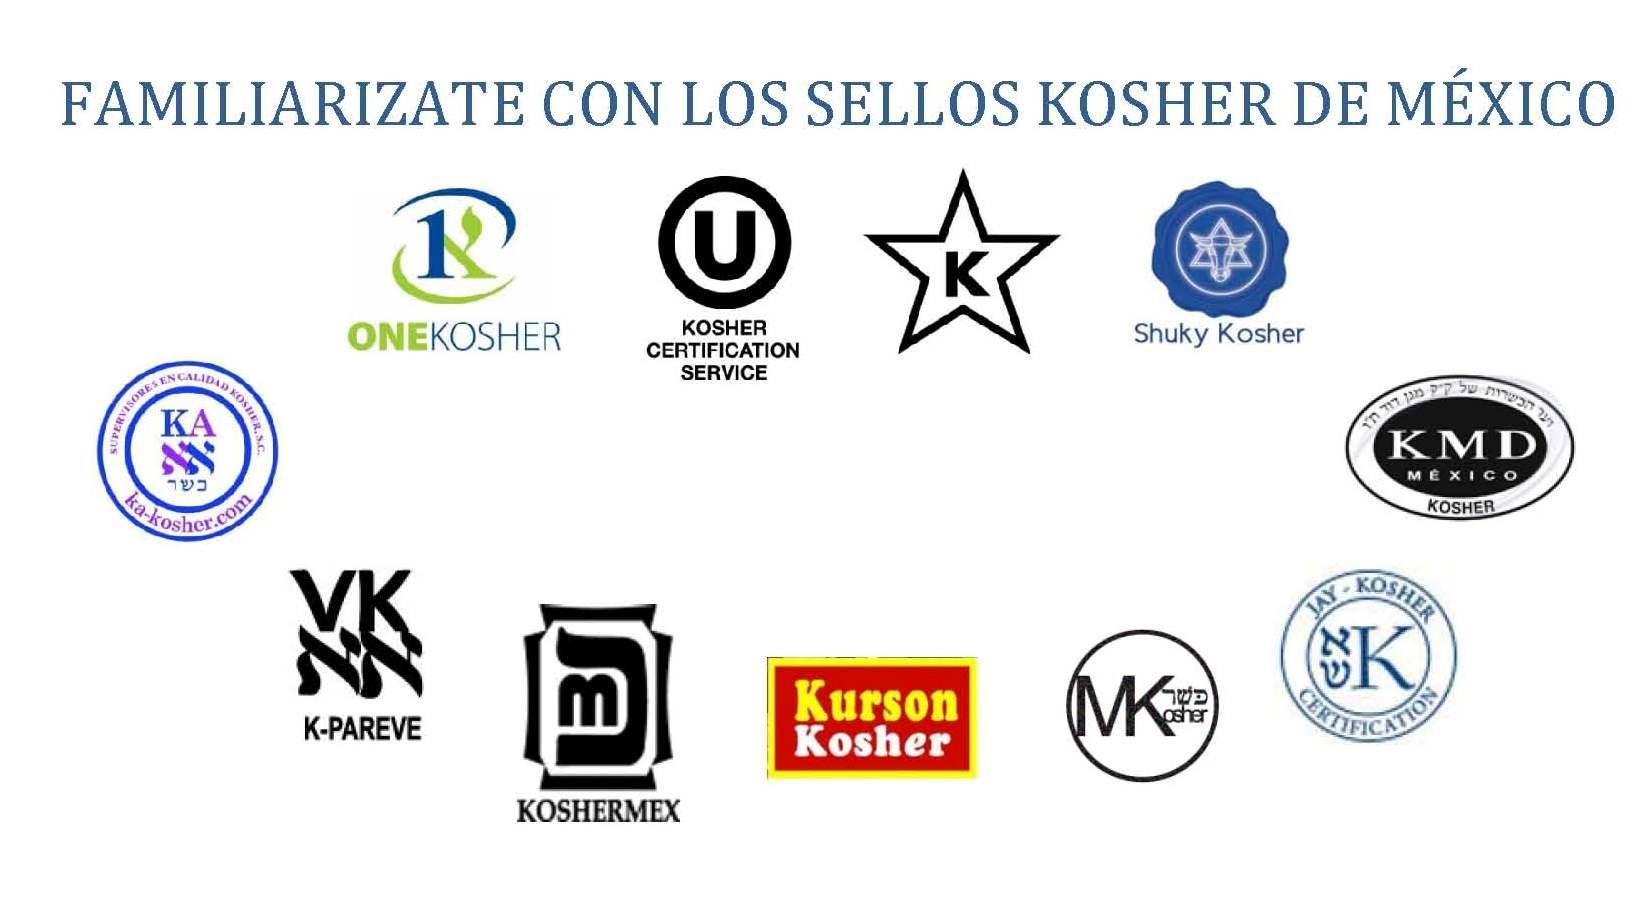 Sellos kosher de mexico kosher pinterest sellos kosher de mexico biocorpaavc